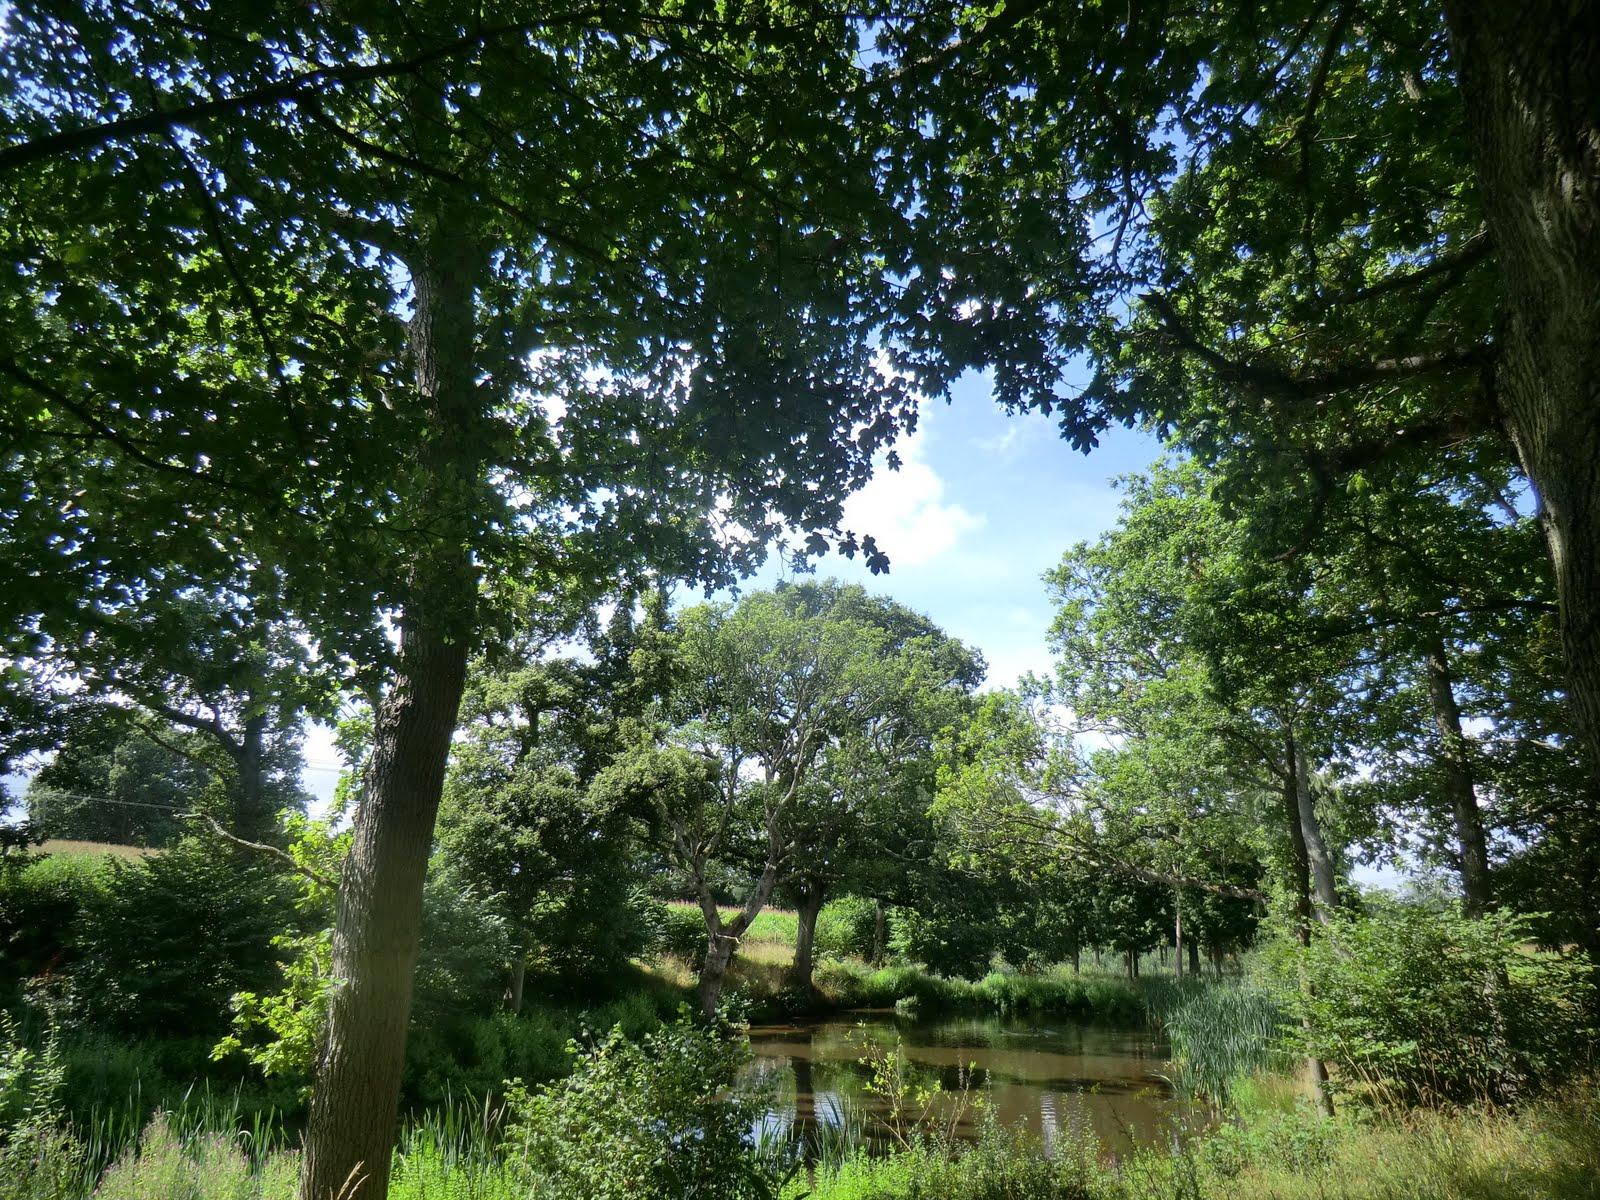 CIMG3922 Pond at Lower Ridges